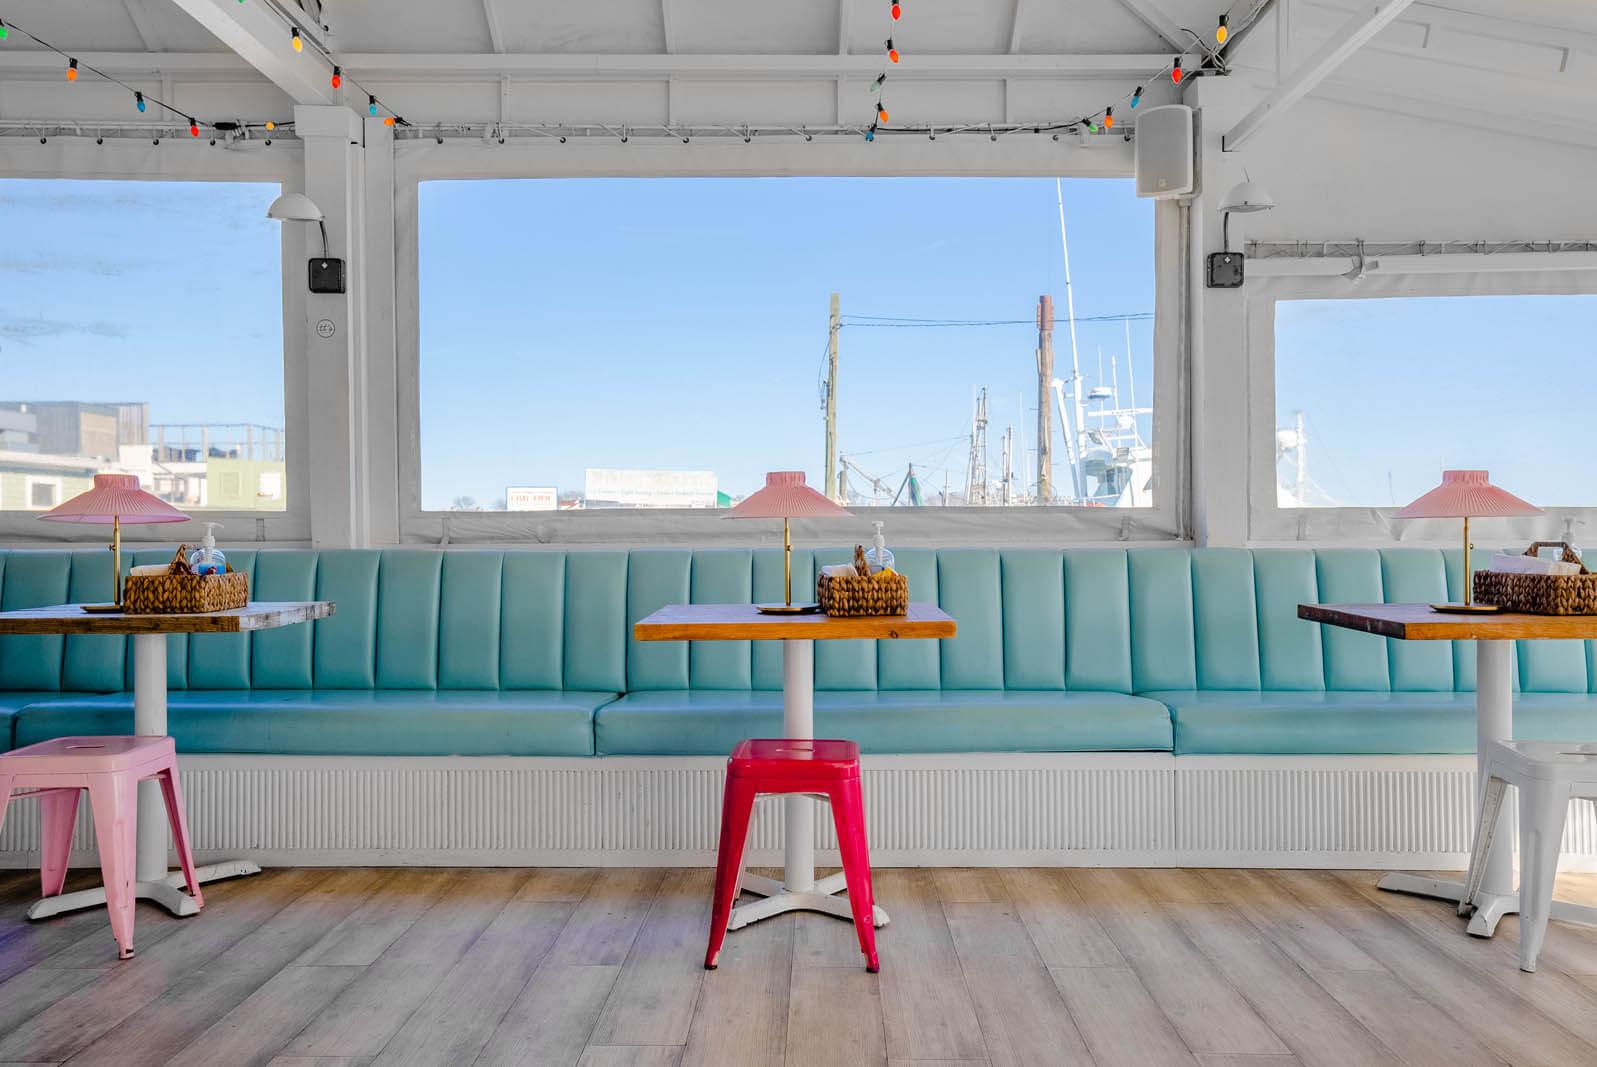 TTs Montauk restaurant interior in the Hamptons New York